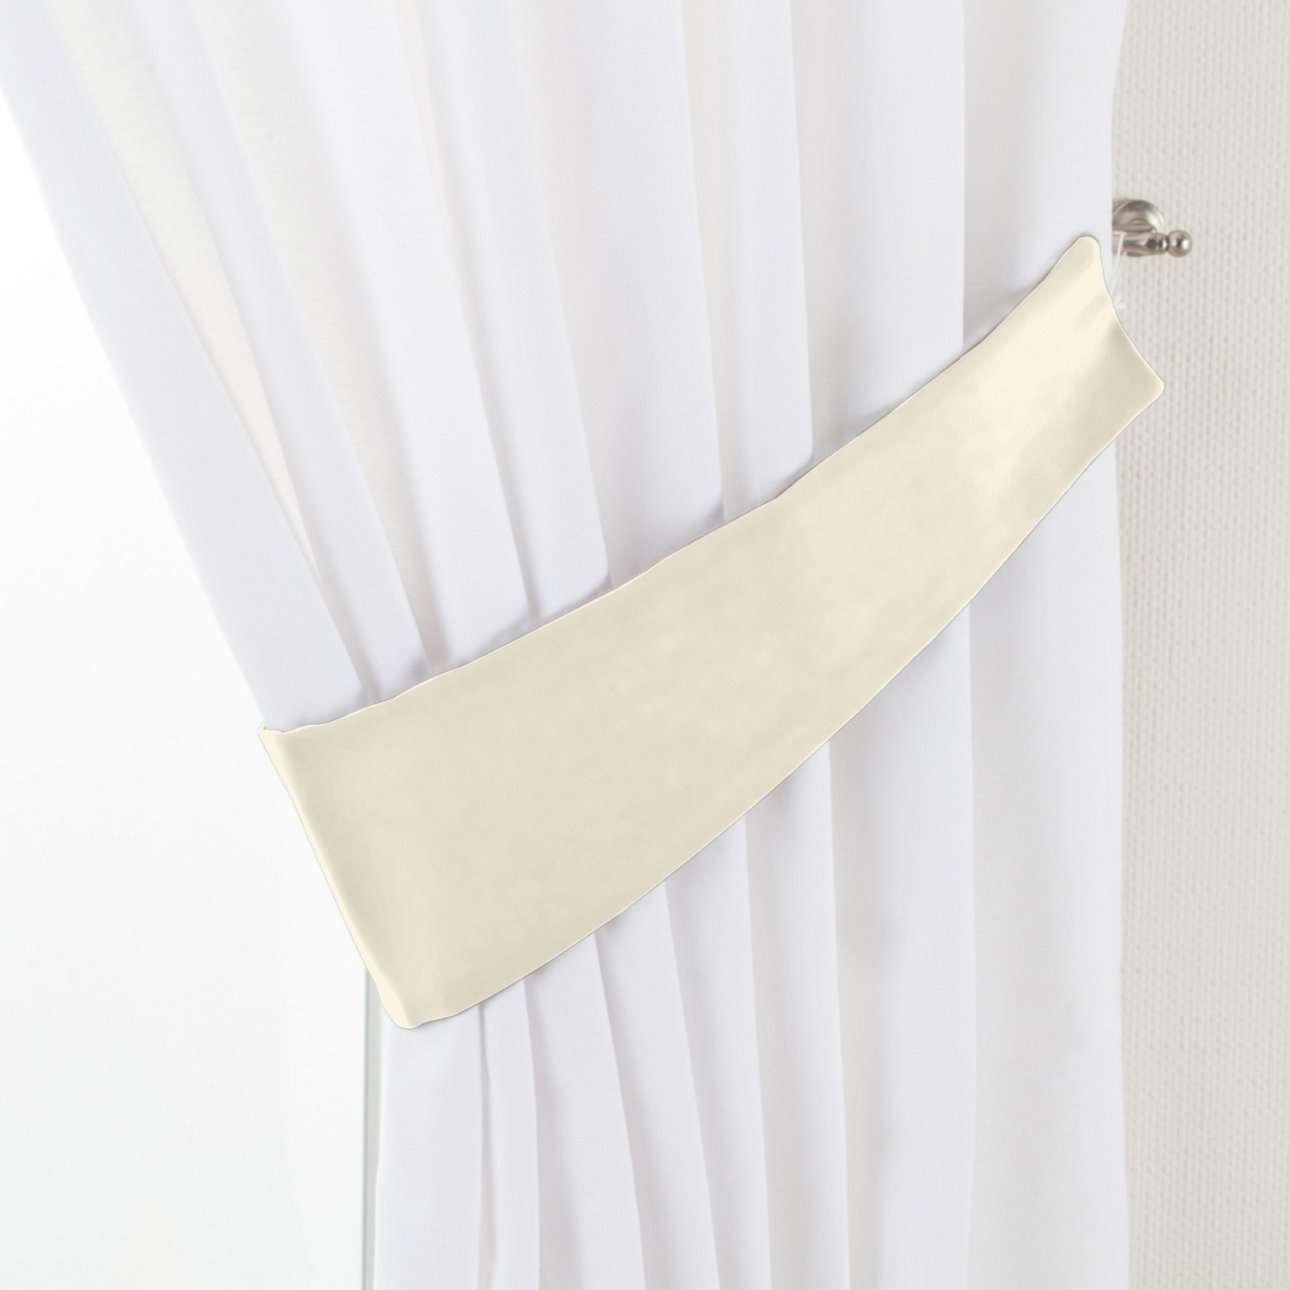 Úchyt Victoria, 1ks V kolekcii Velvet, tkanina: 704-10